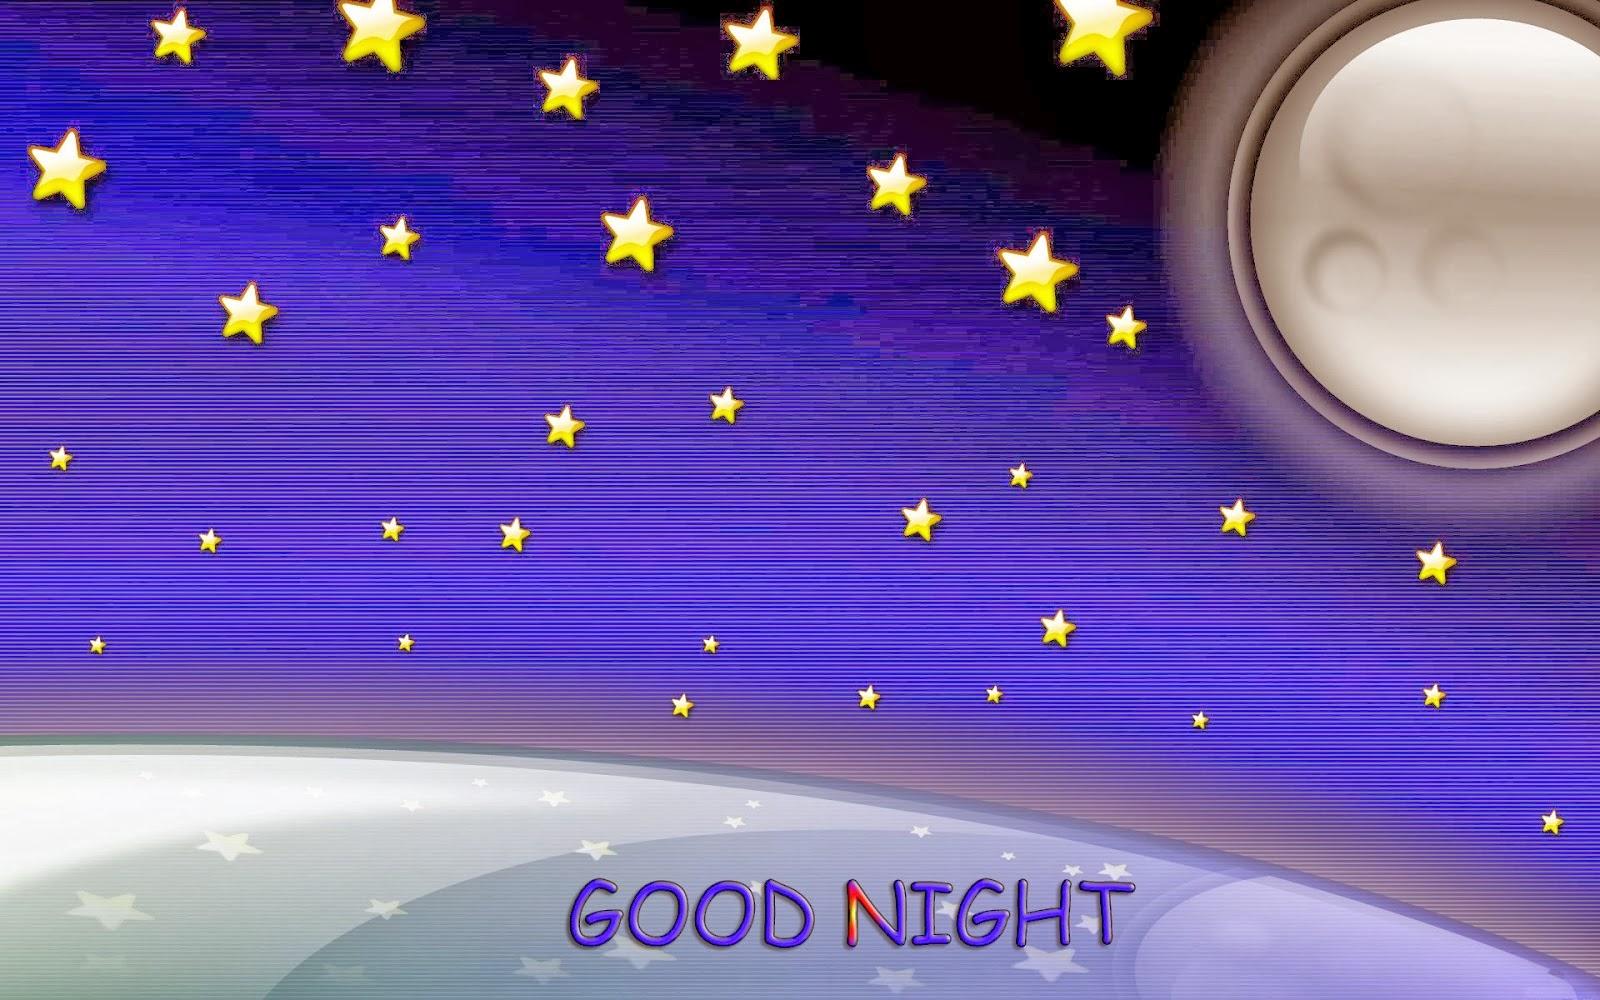 Wallpaper download night - Wallpaper Download Night Good Night Hd Wallpapers Free Download Unique Wallpapers